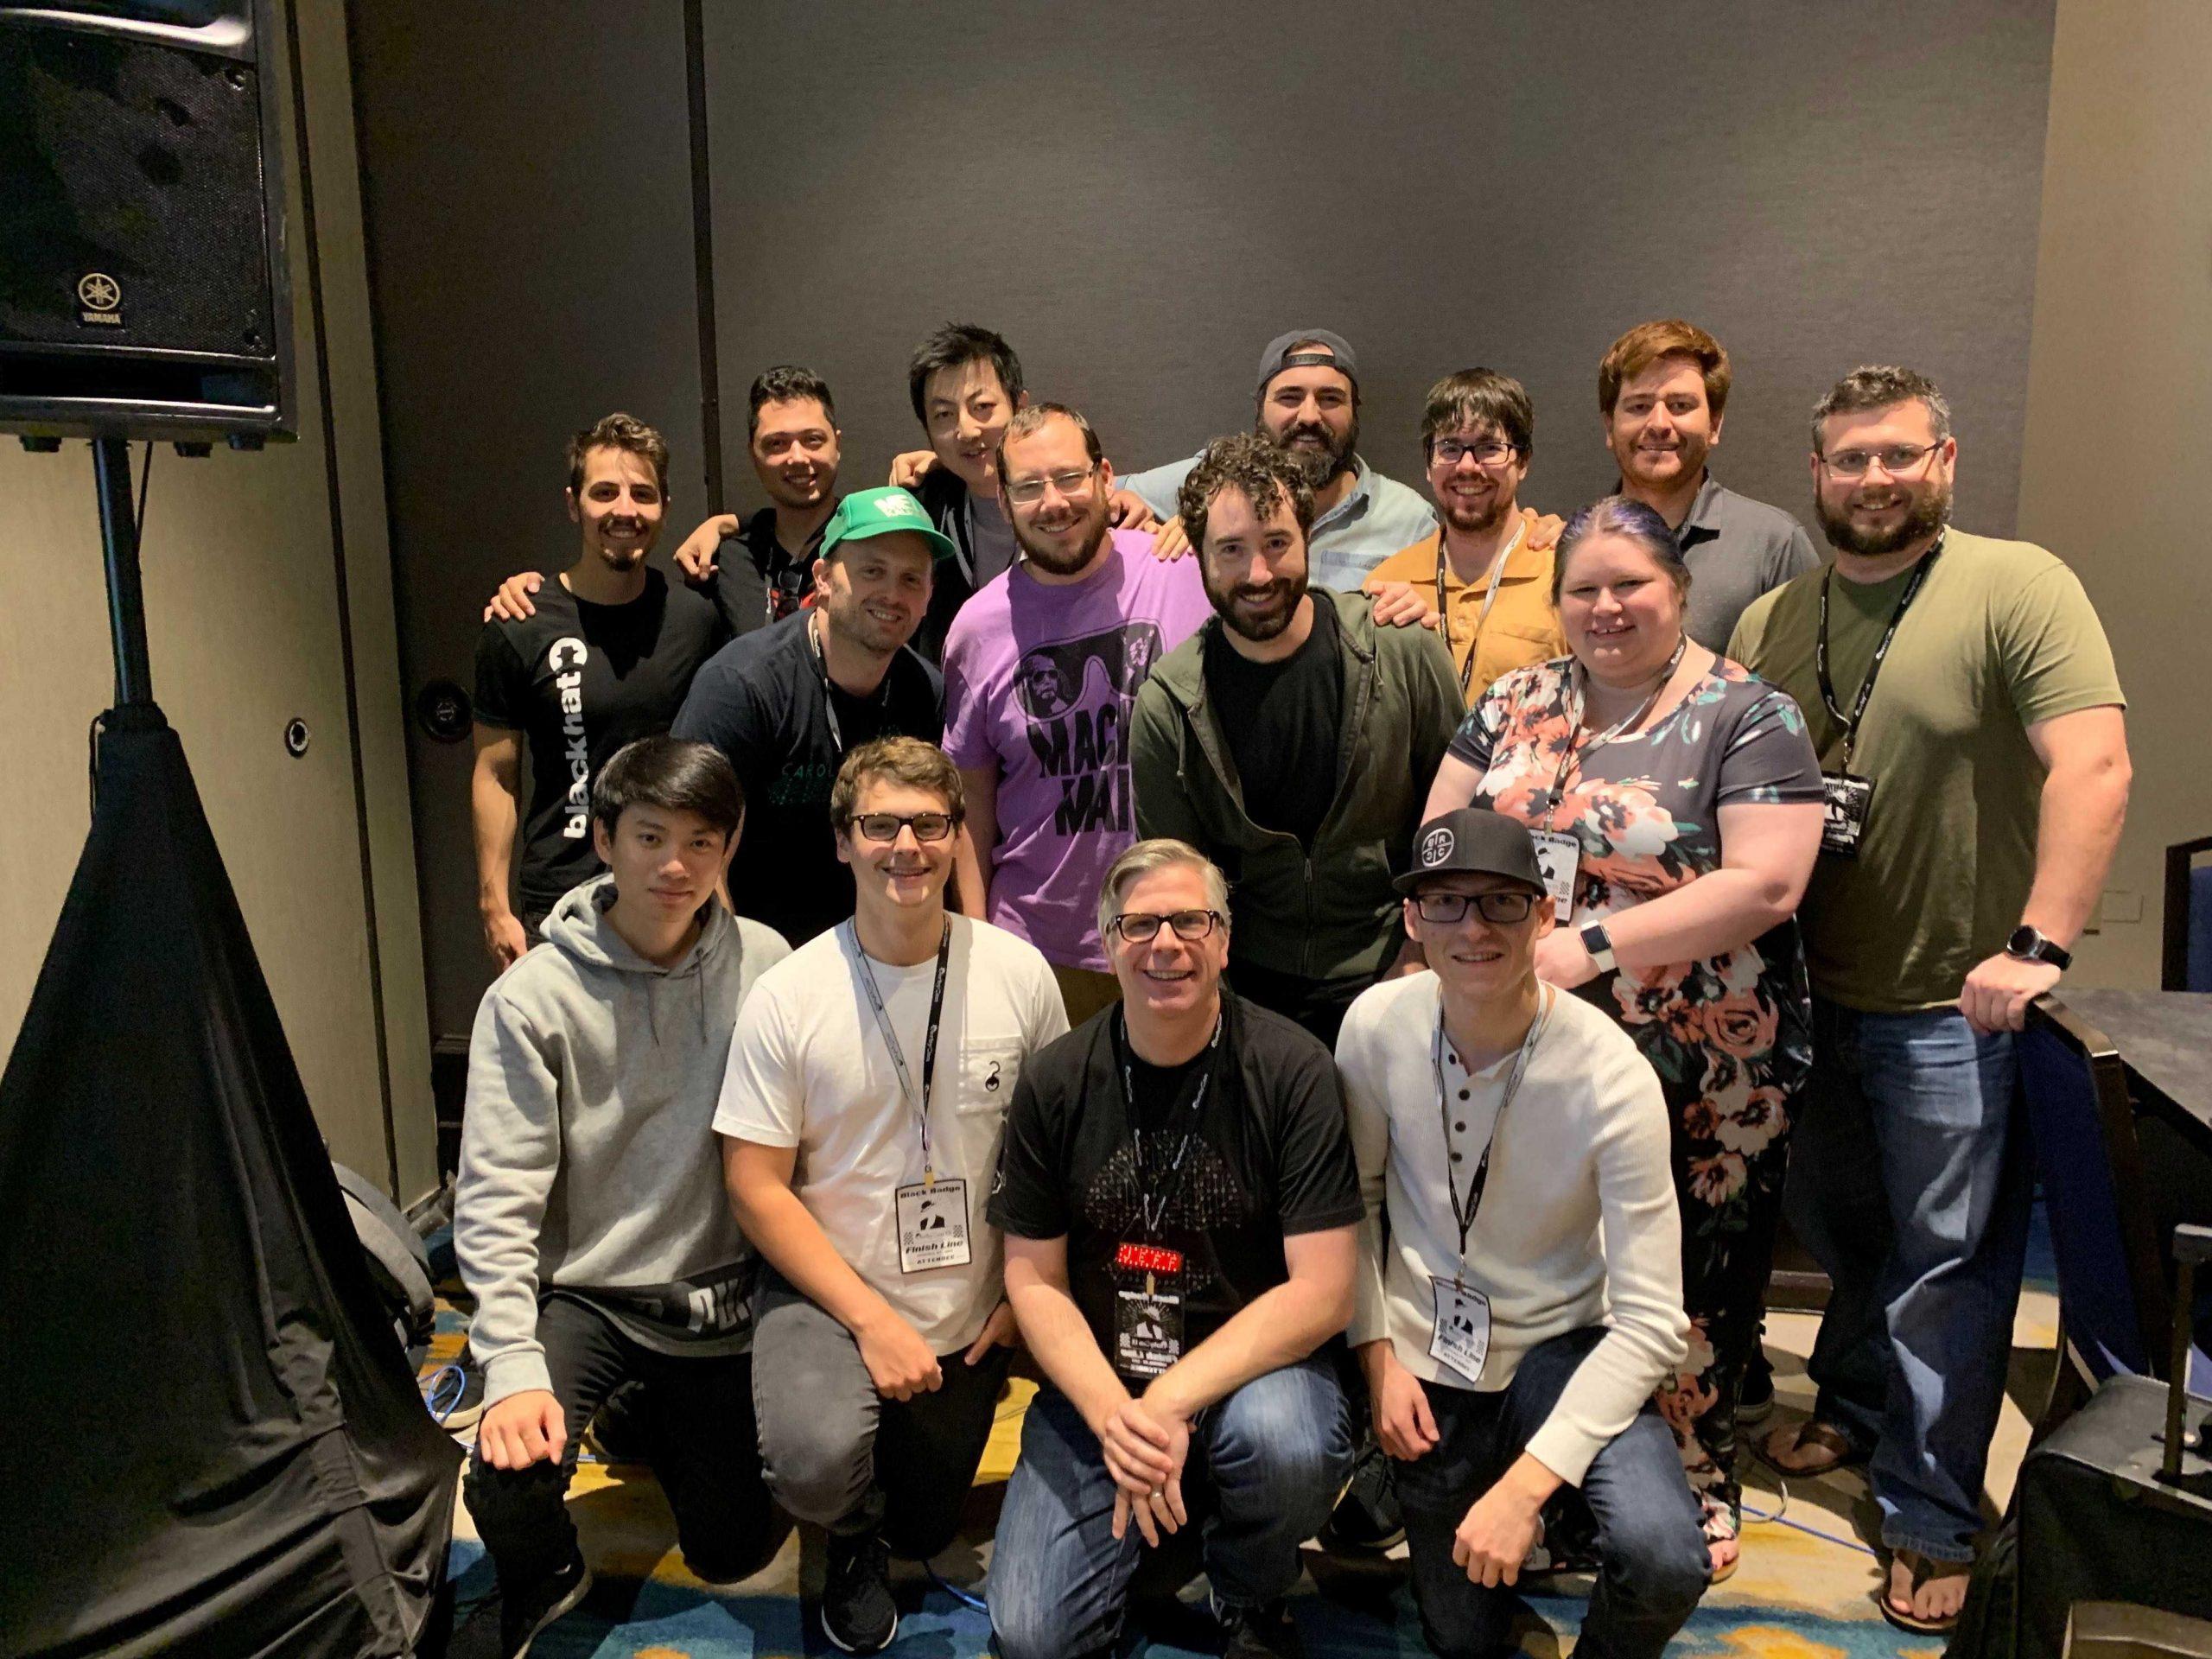 Team EverSec photo